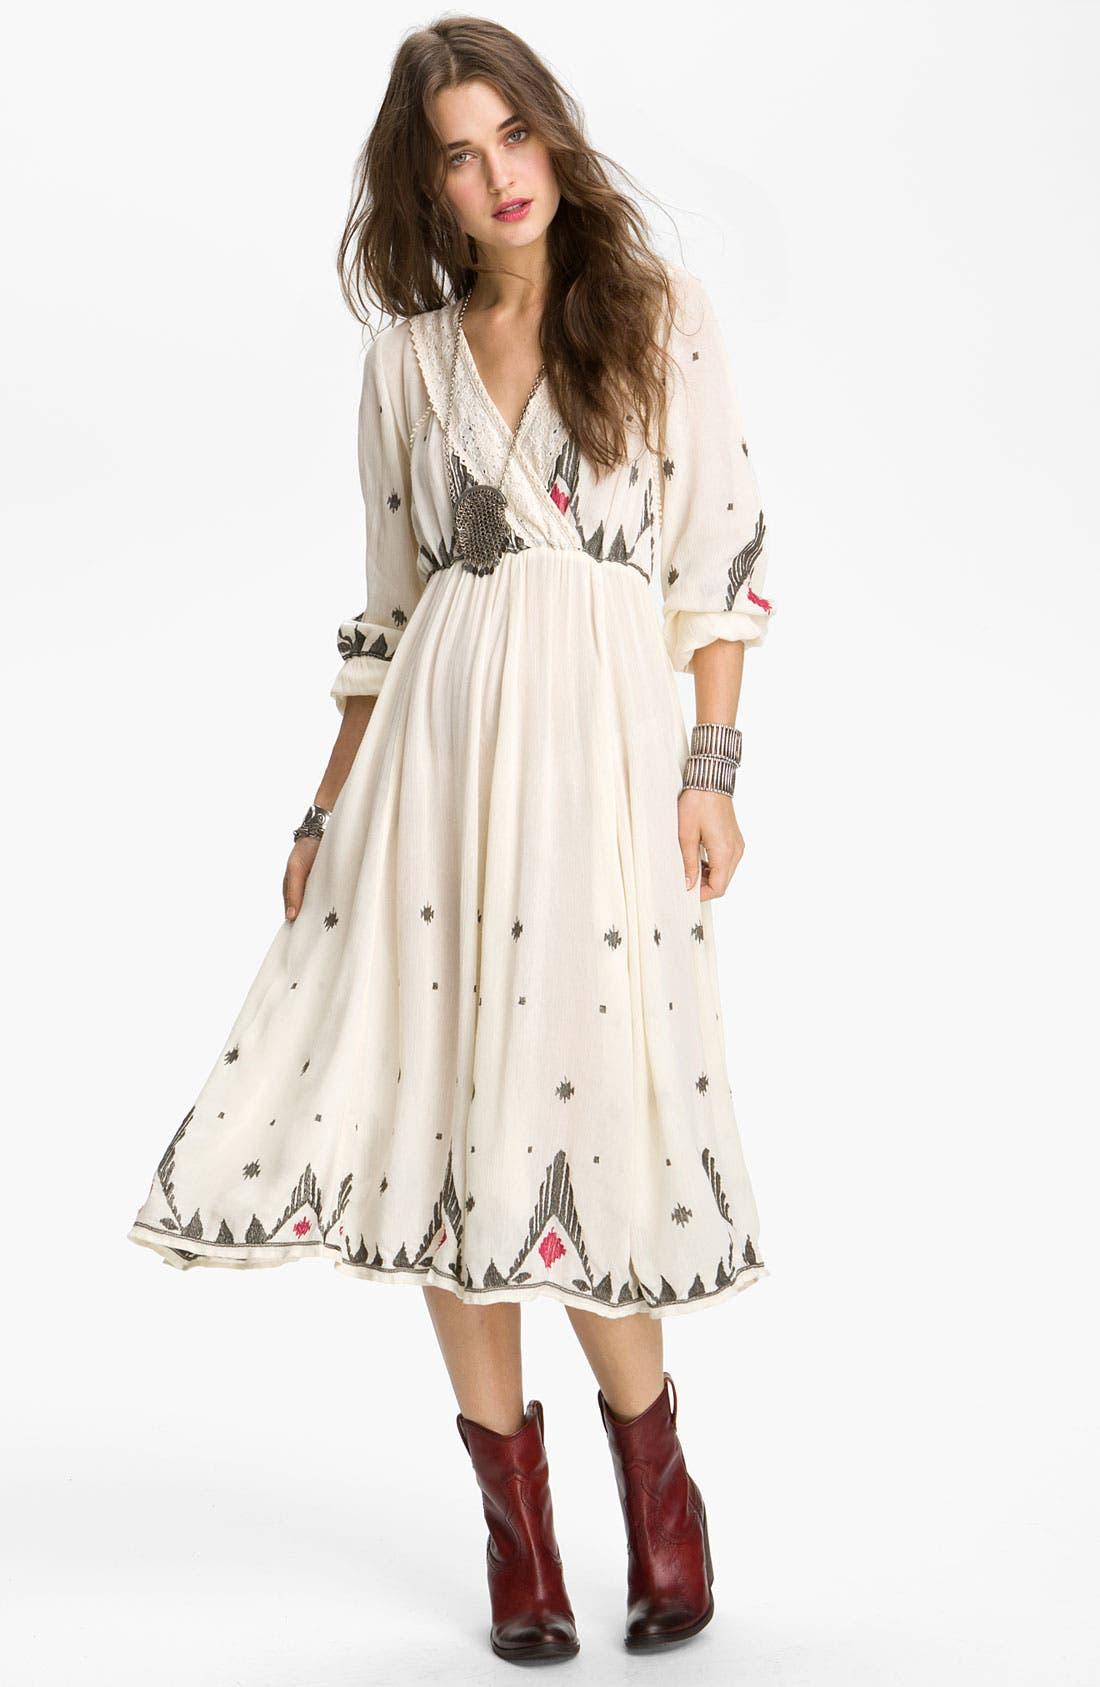 Free People Splendor Embroidered Peasant Dress Nordstrom